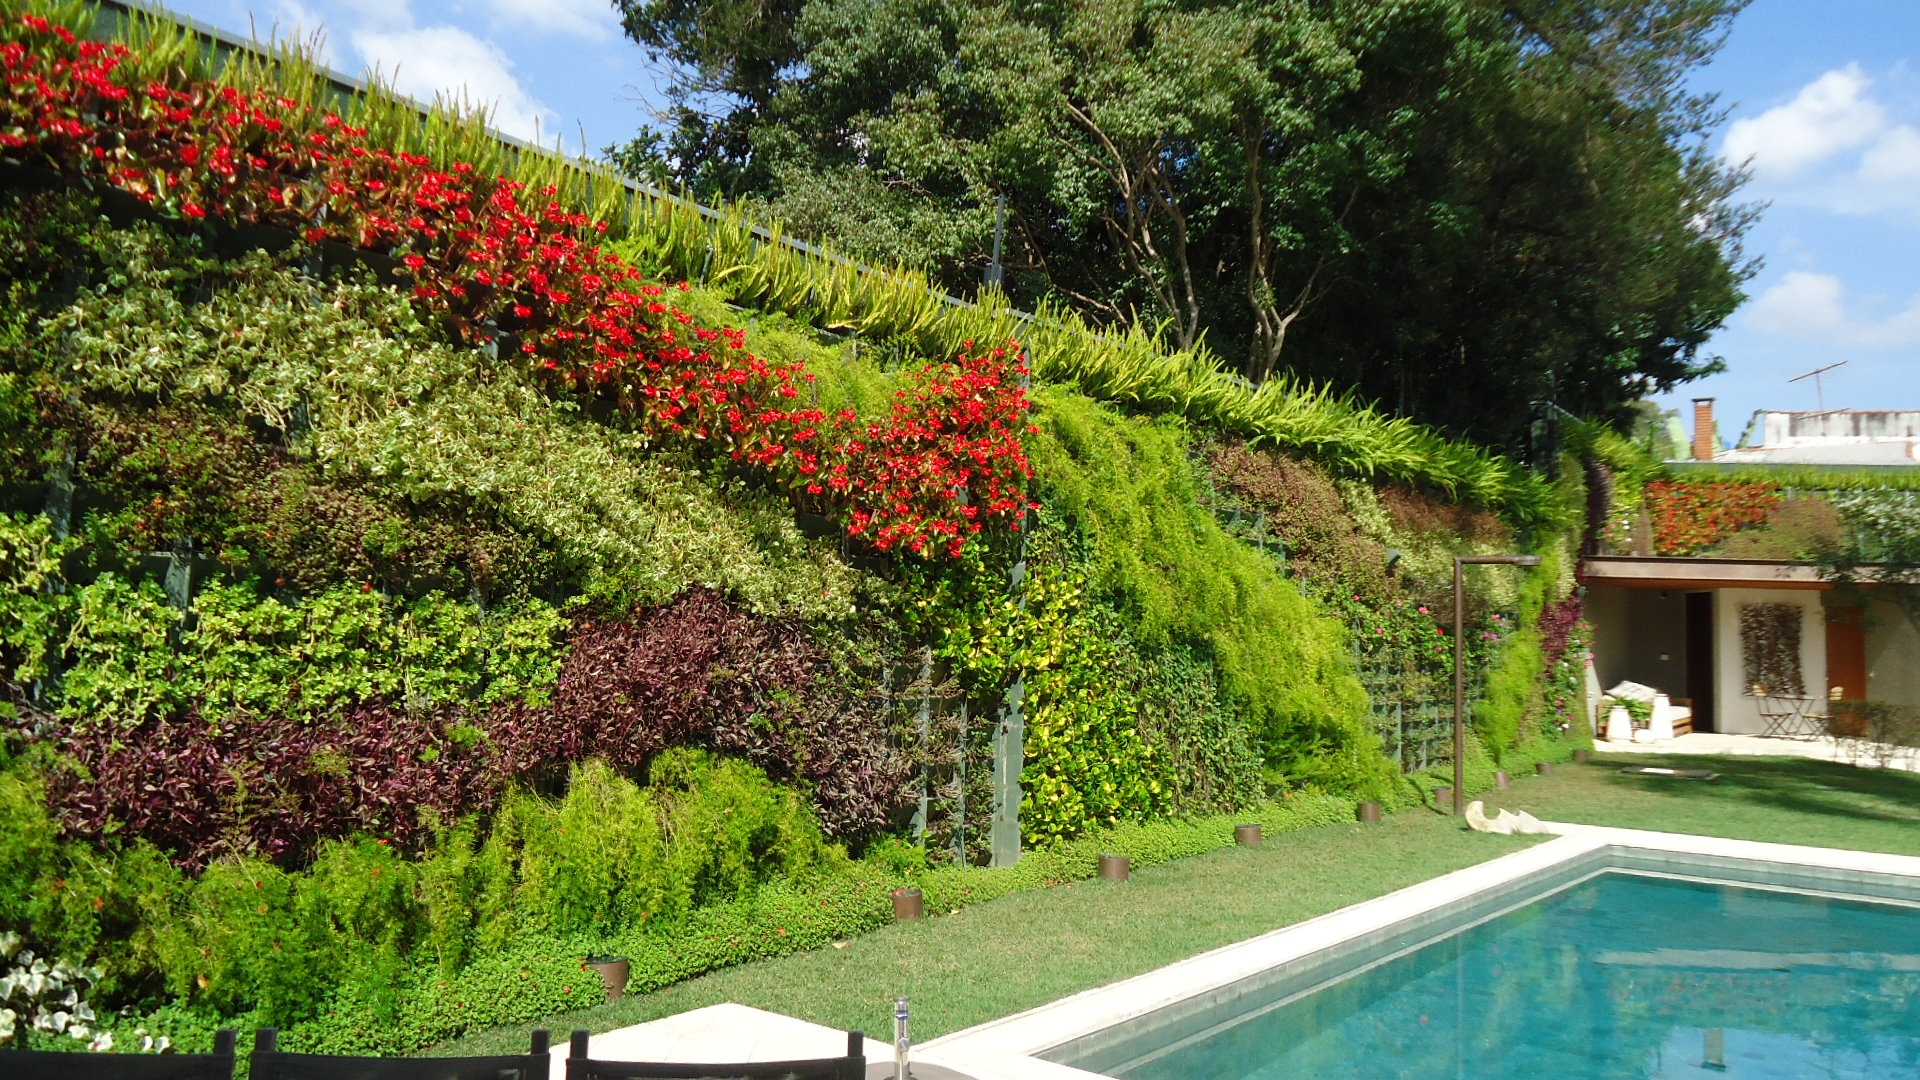 jardim vertical em muro:JARDIM VERTICAL, INSPIRE-SE